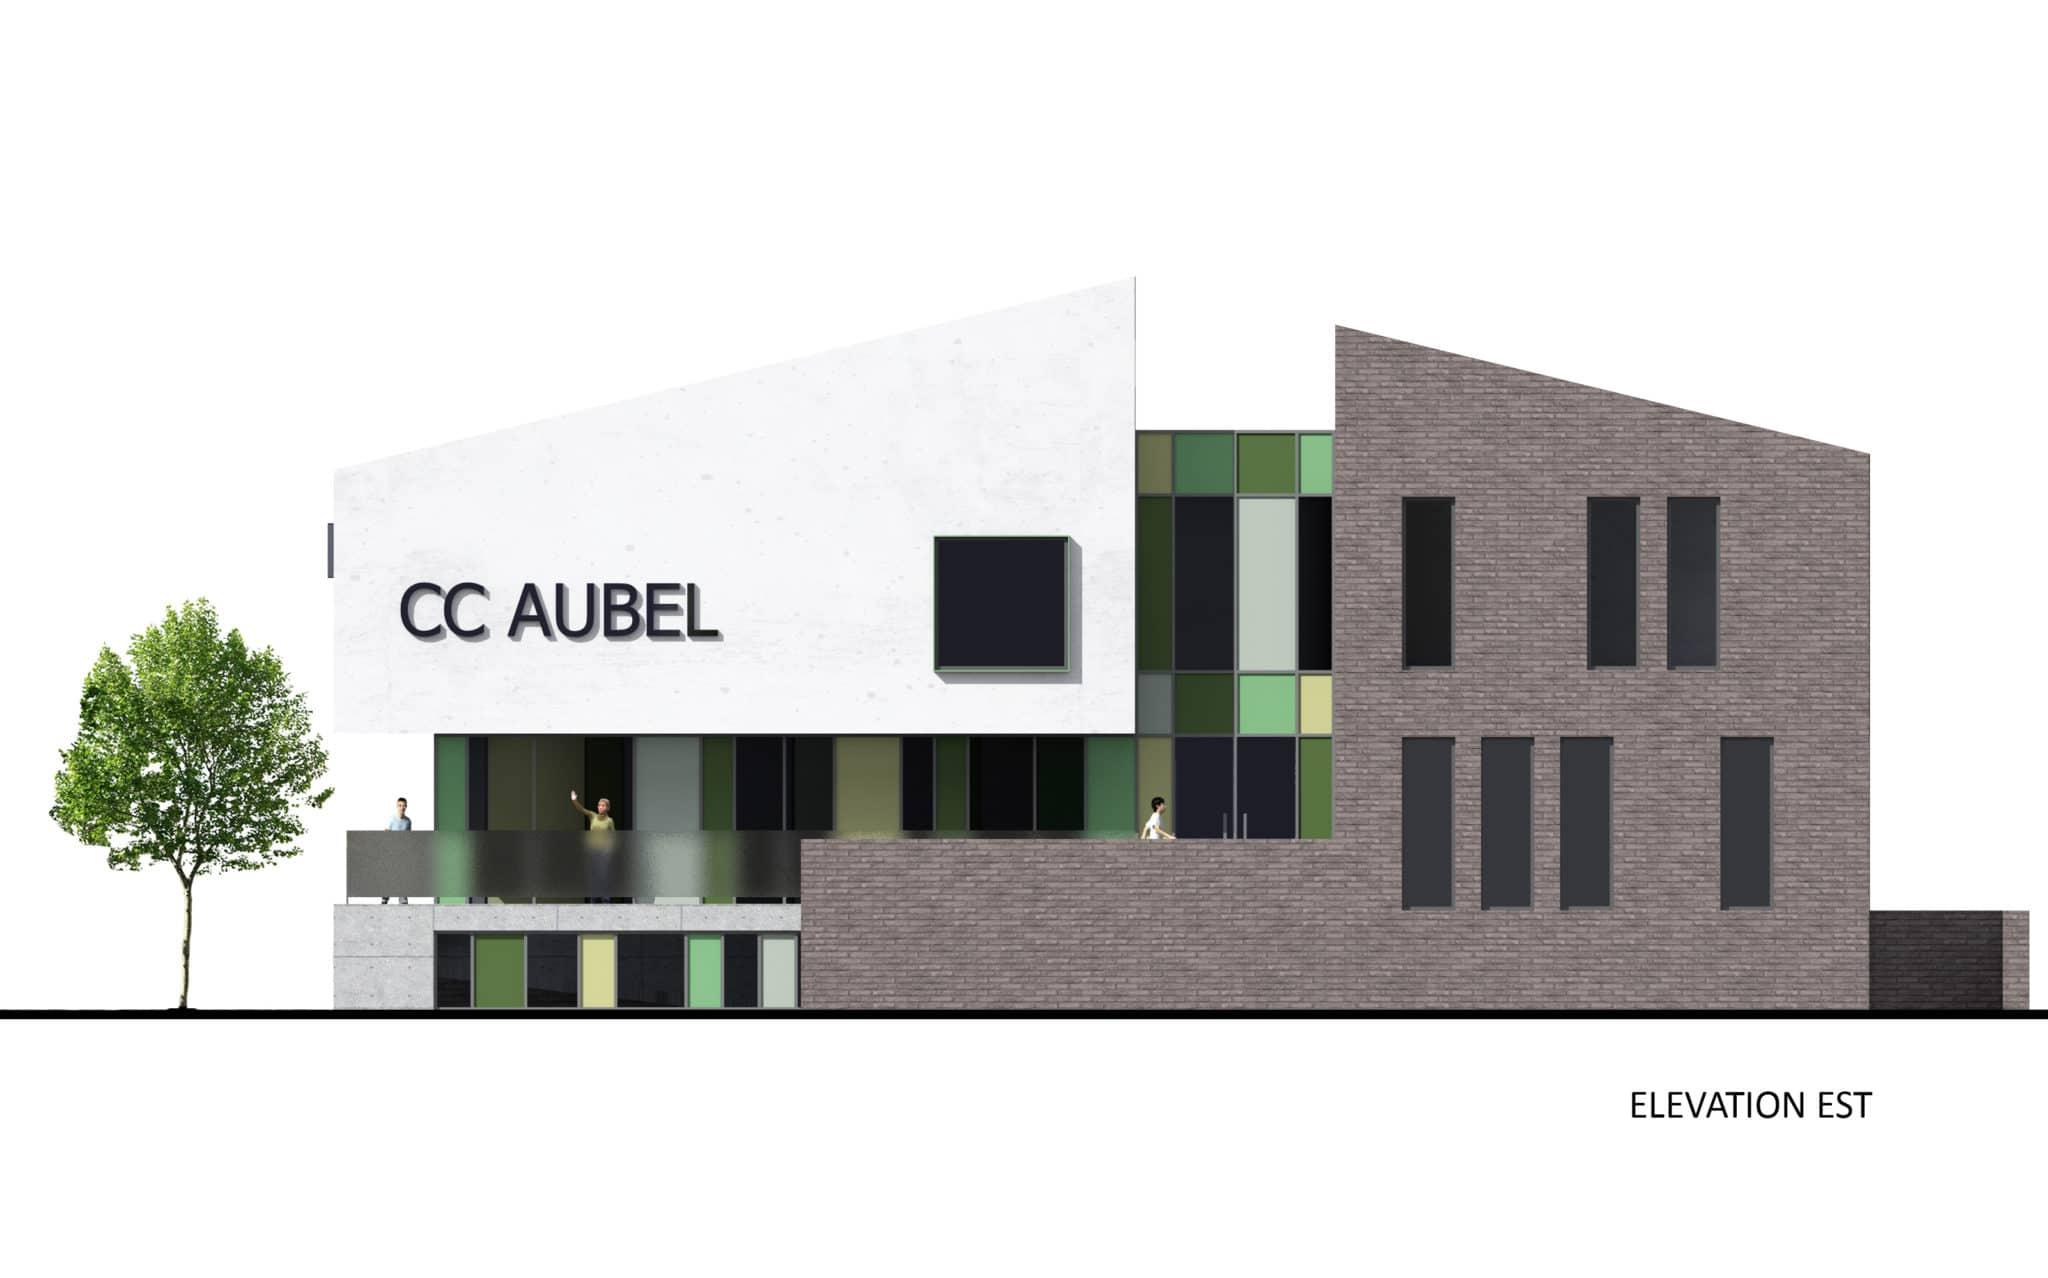 Aubel ELEVATION EST